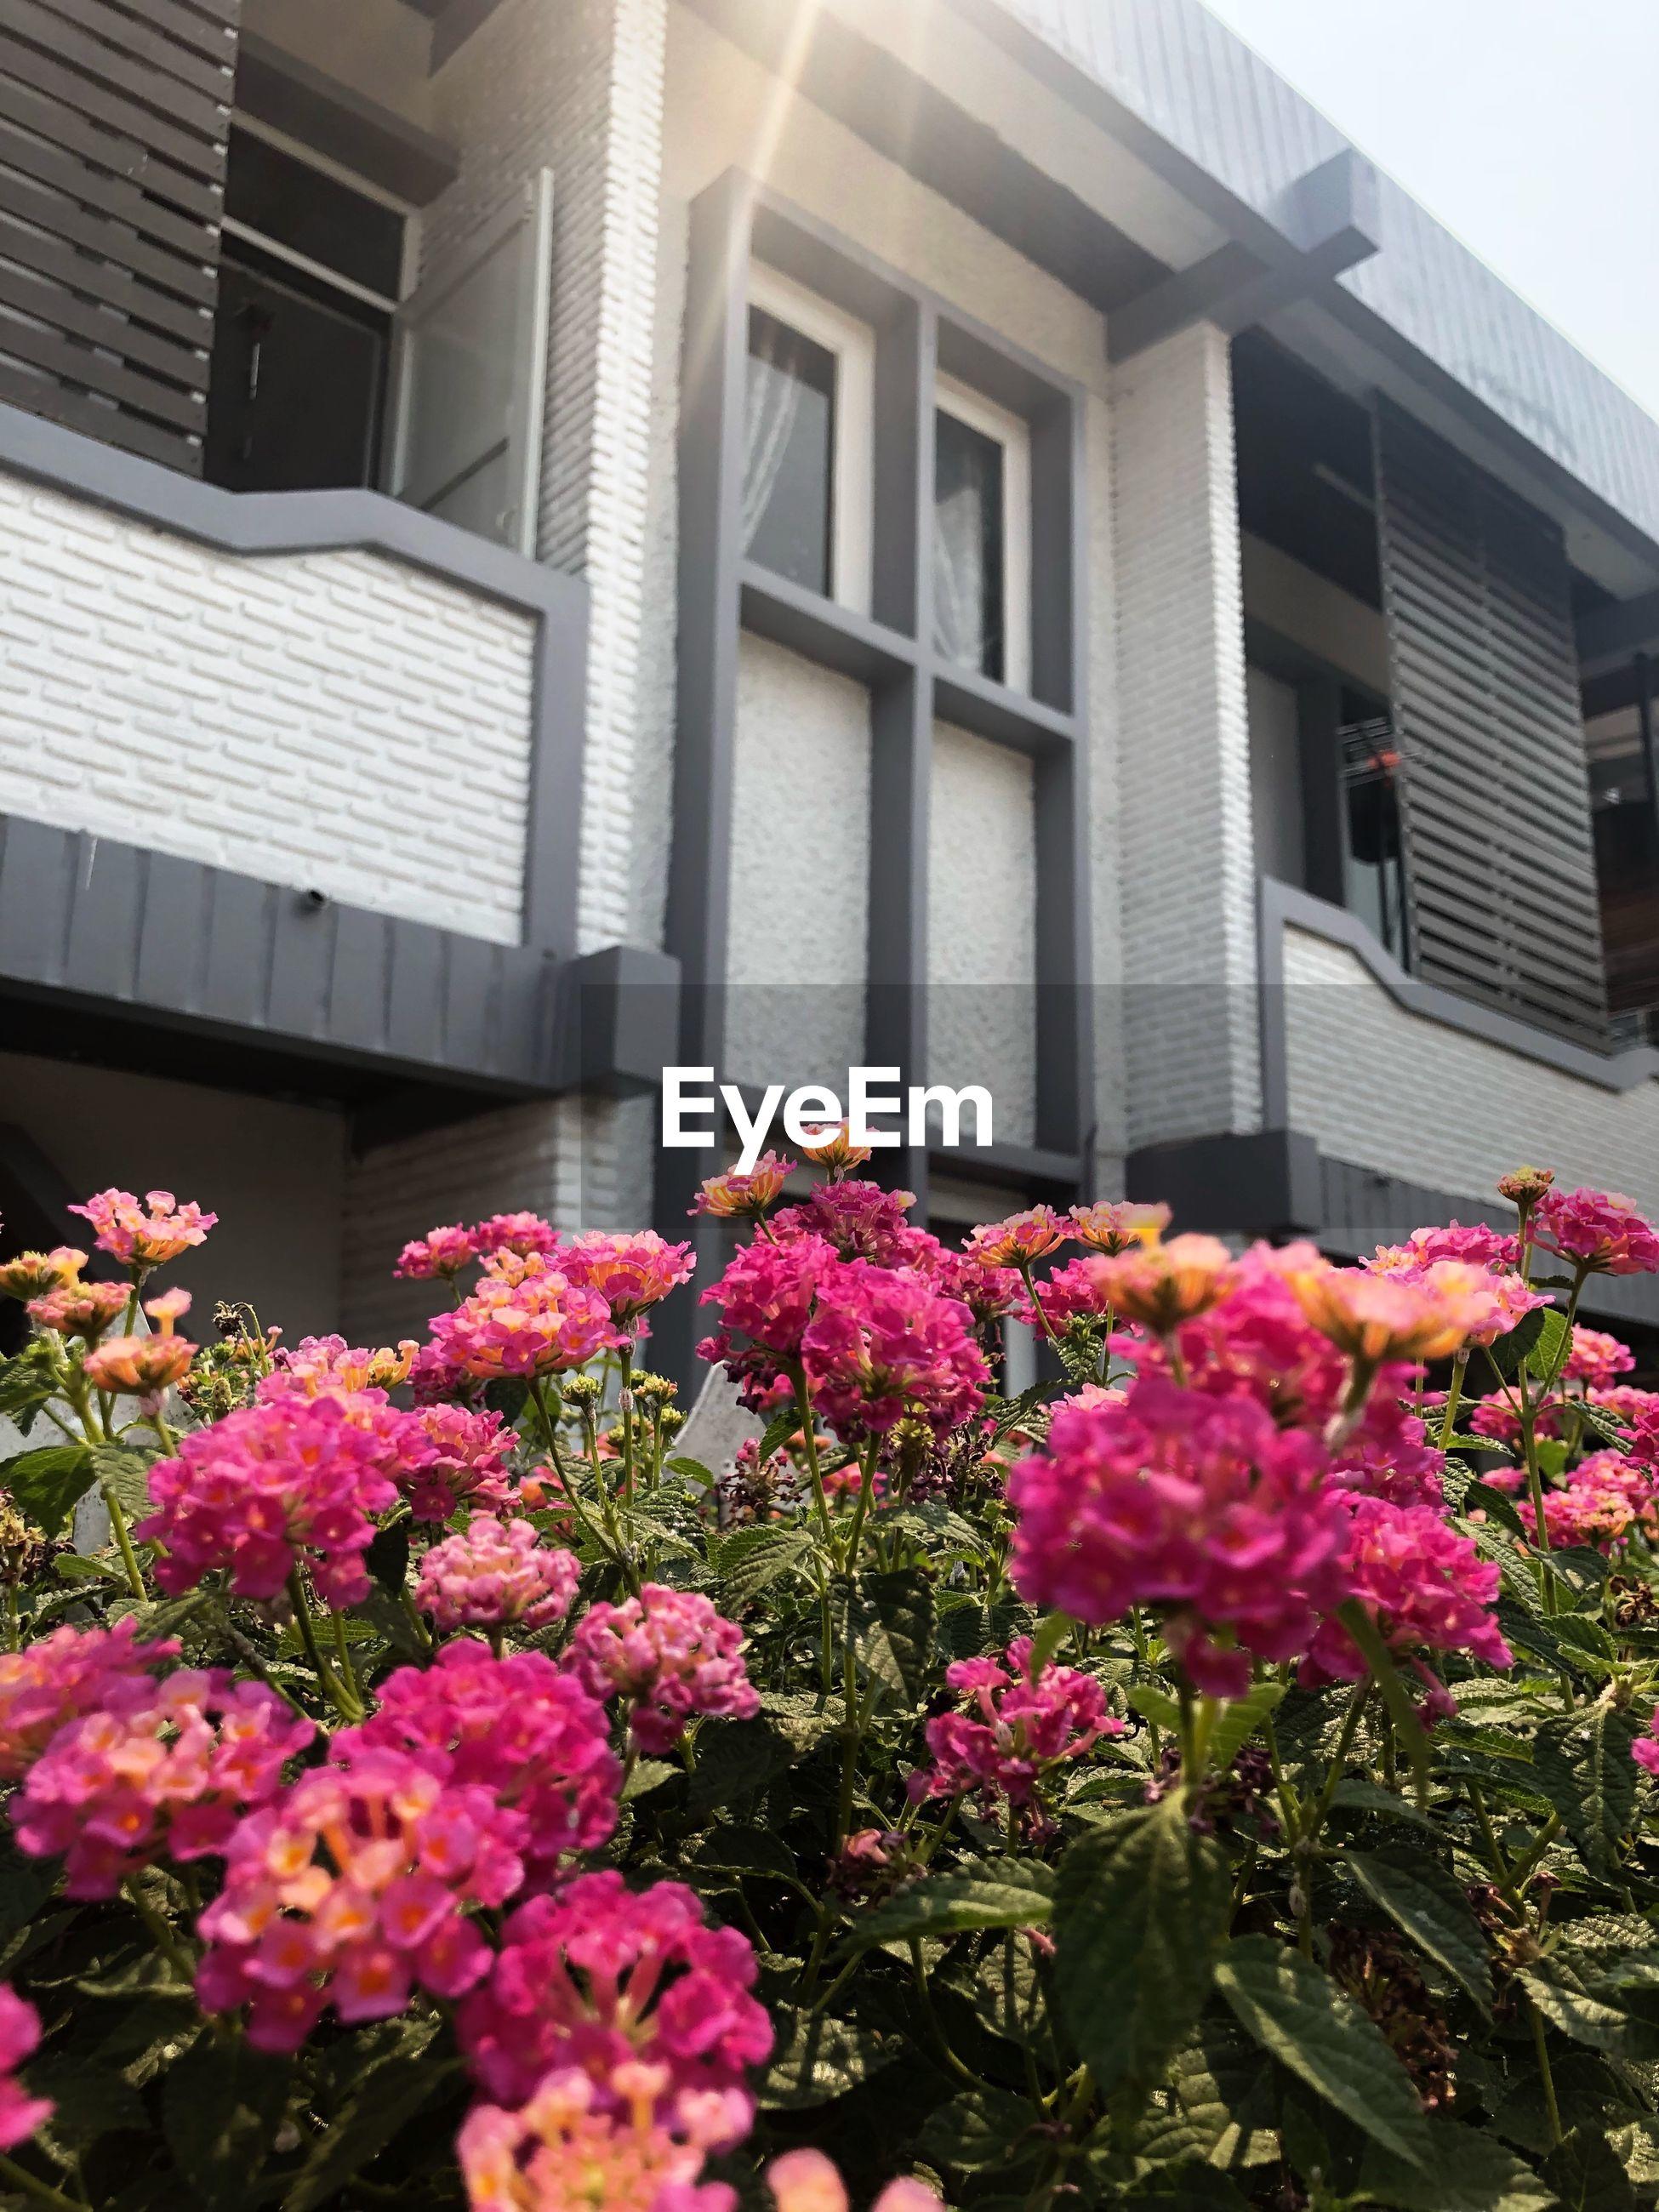 PINK FLOWERING PLANTS BY WINDOW OF BUILDING